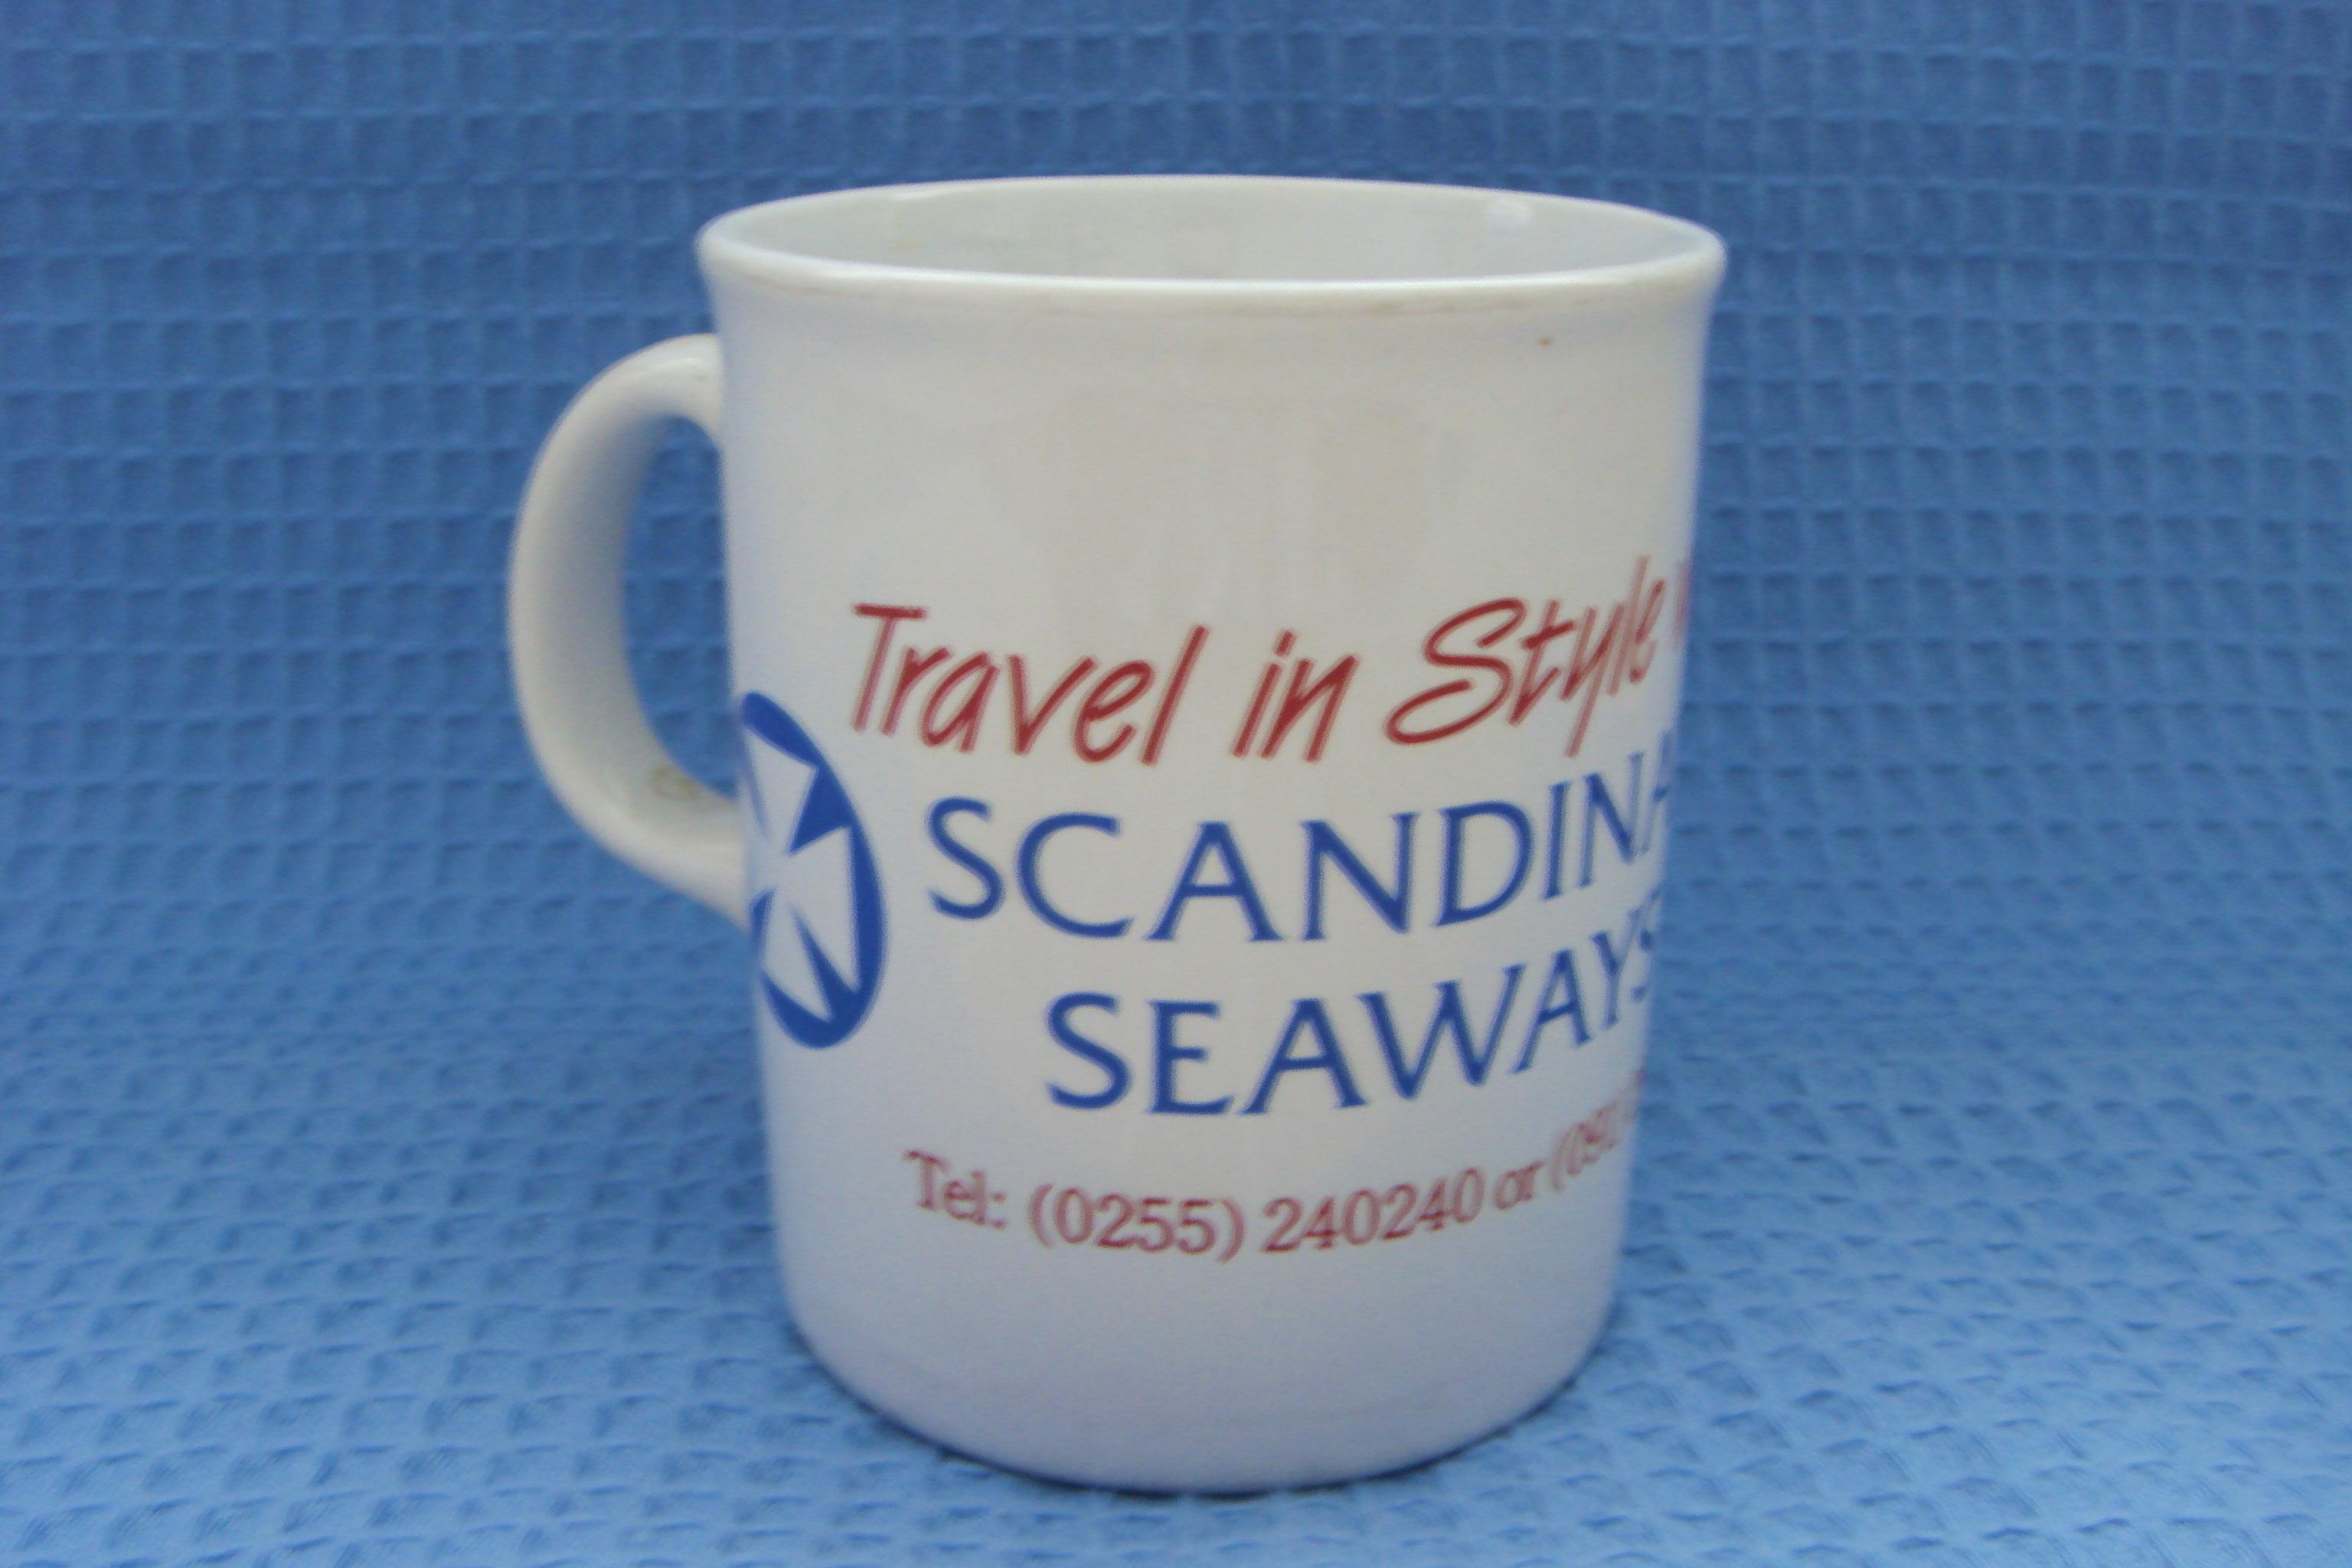 SOUVENIR CHINA MUG FROM THE SCANDINAVIAN SEAWAYS SERVICE COMPANY